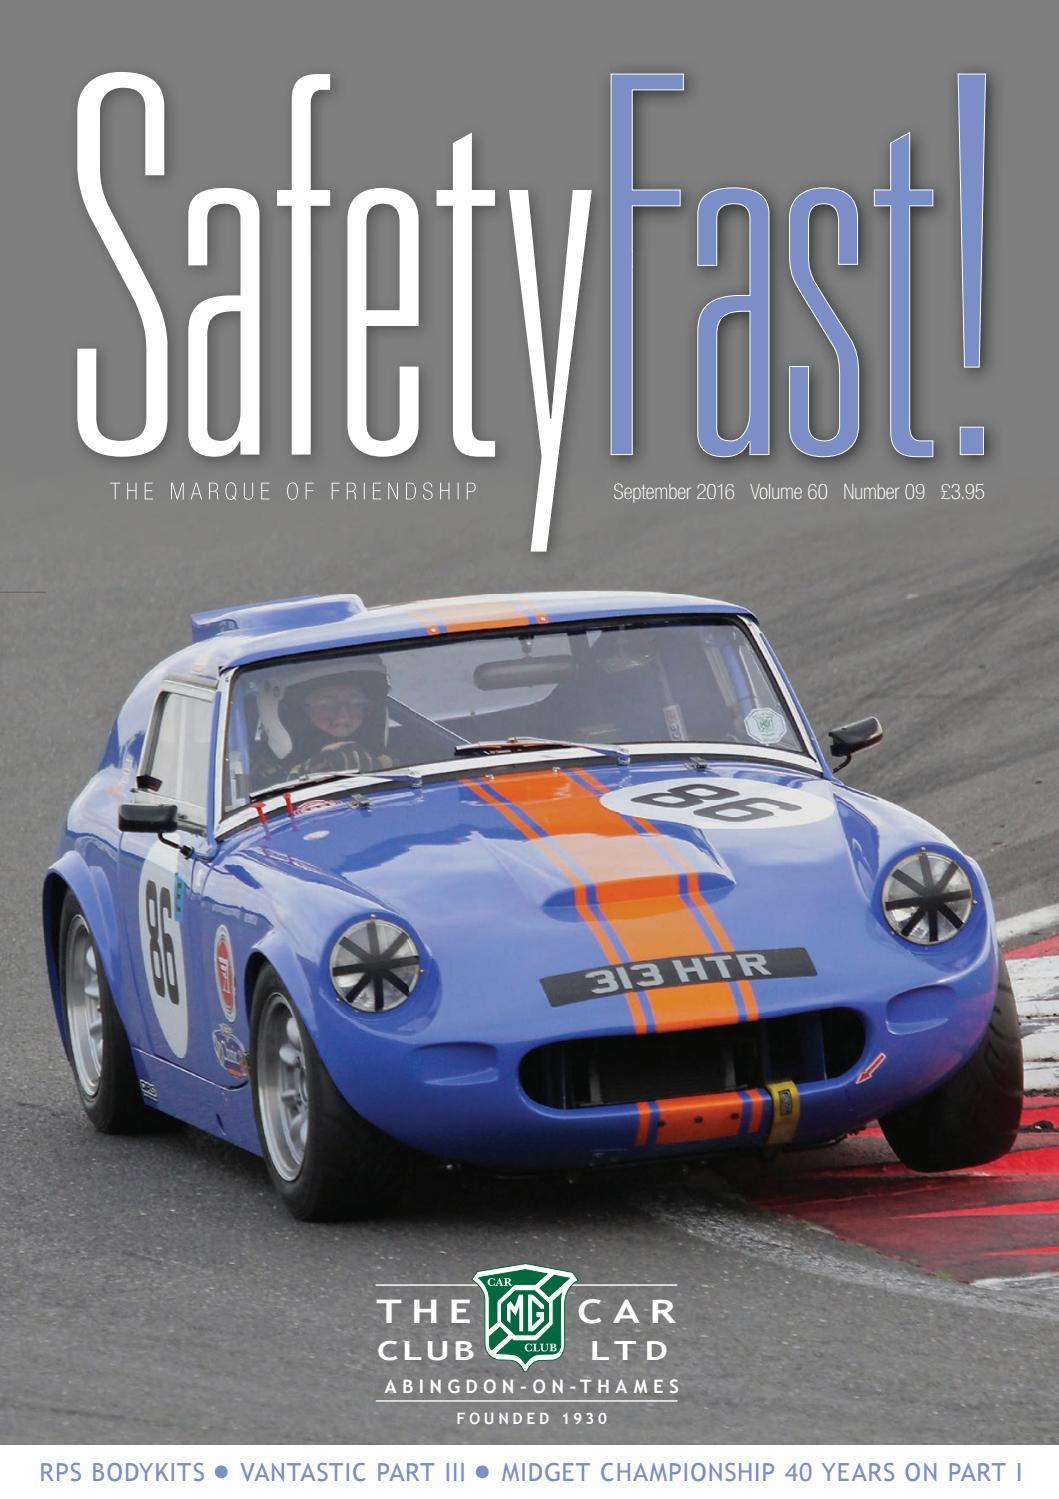 c6639f3f32 Safety Fast! September 2016 by MG Car Club - issuu